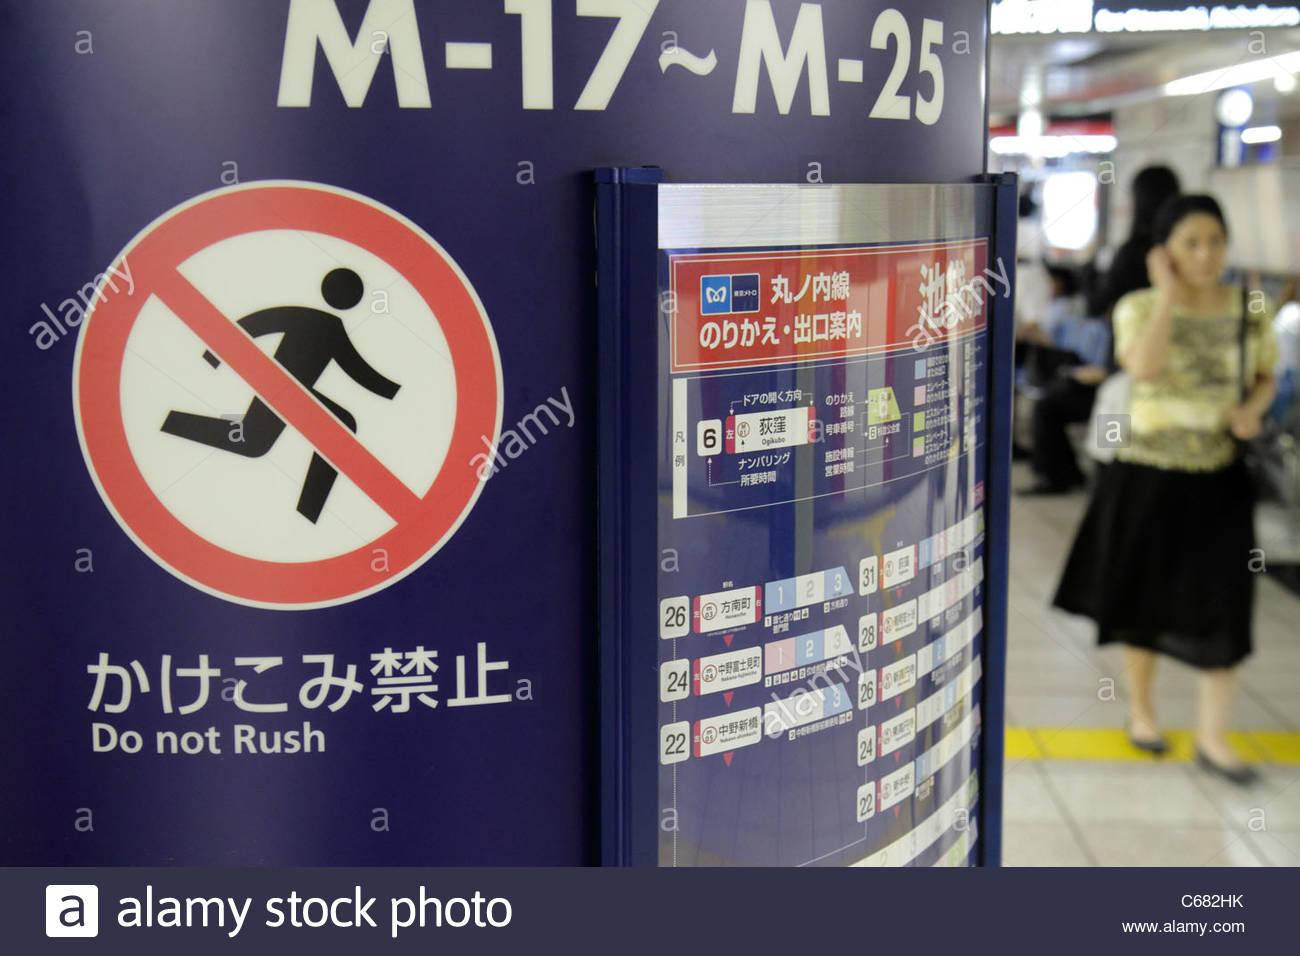 Tokyo japan ginza ginza metro station subway train kanji hiragana tokyo japan ginza ginza metro station subway train kanji hiragana katakana characters symbols japanese english rough translation buycottarizona Images